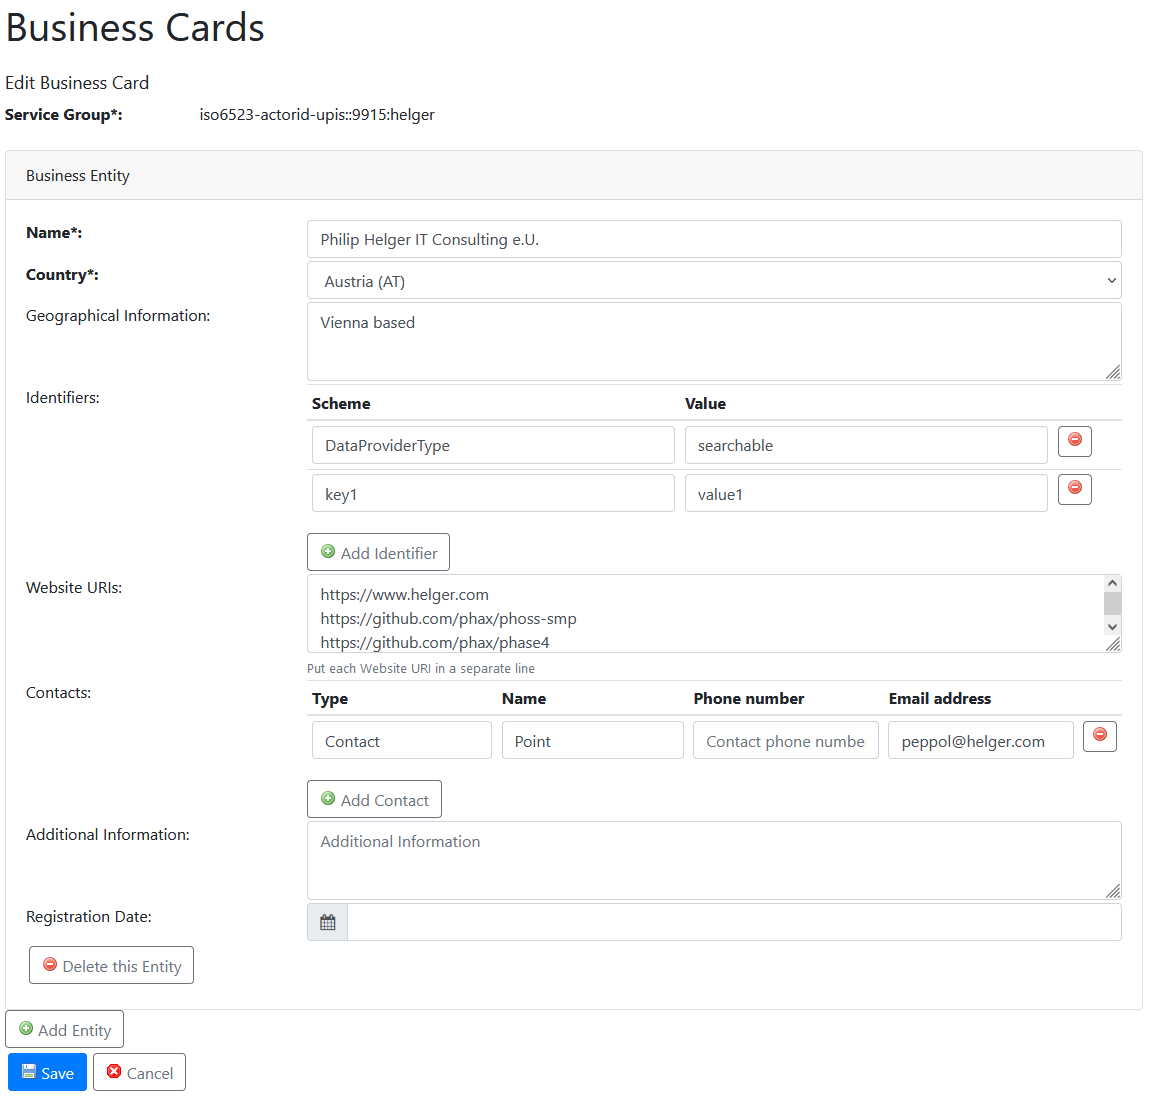 Edit Business Cards